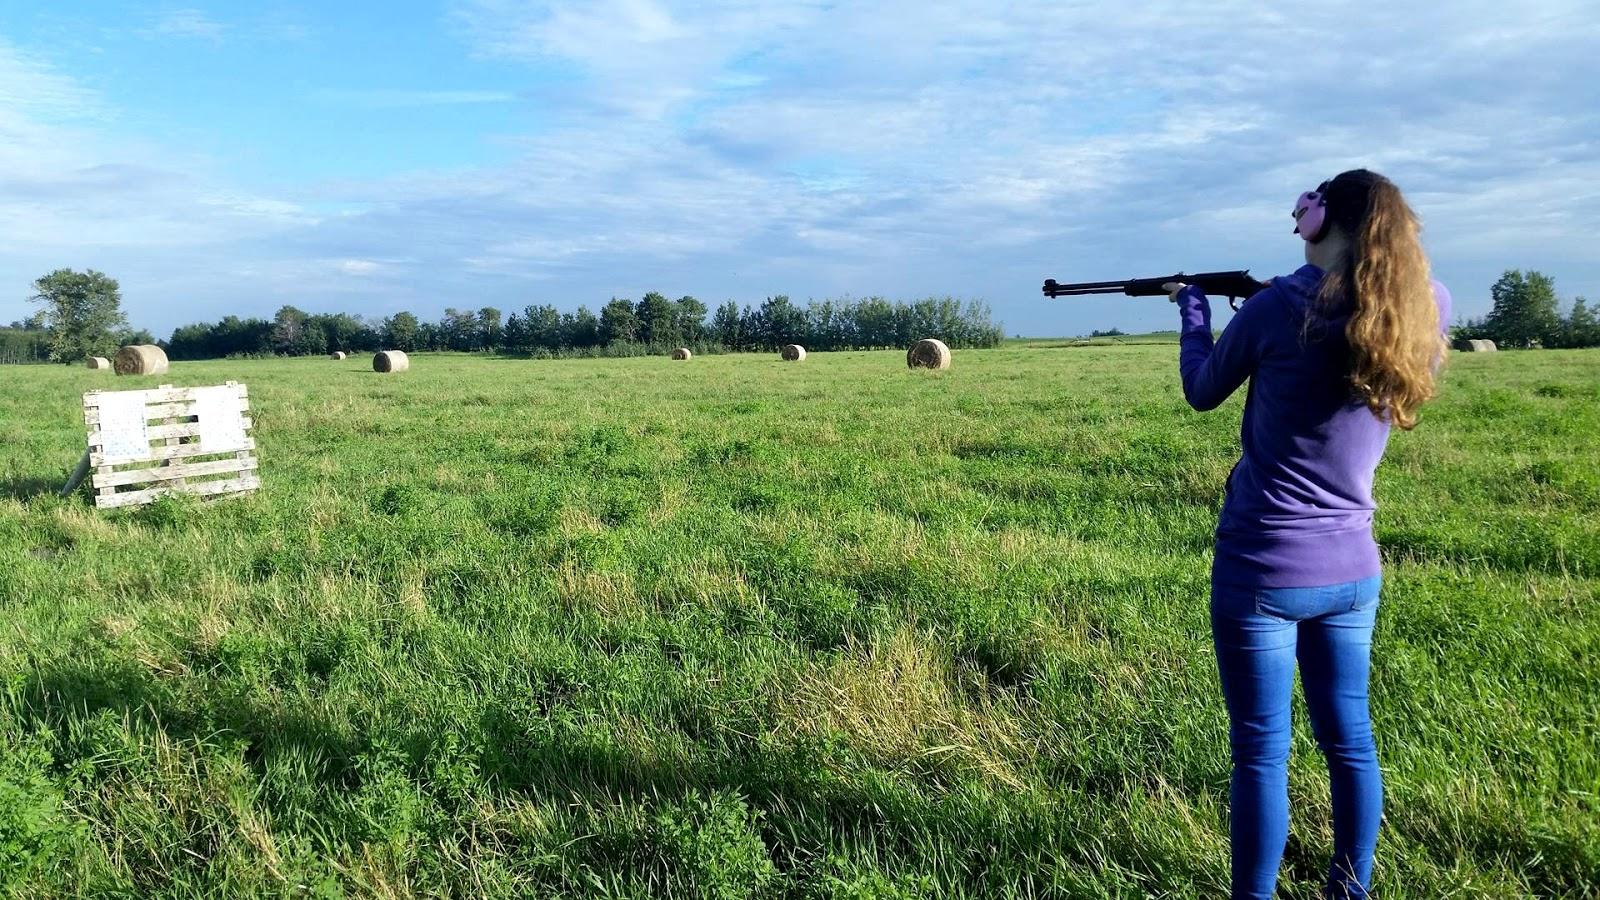 Farm Land near Edmonton Alberta Rifle Target Shooting